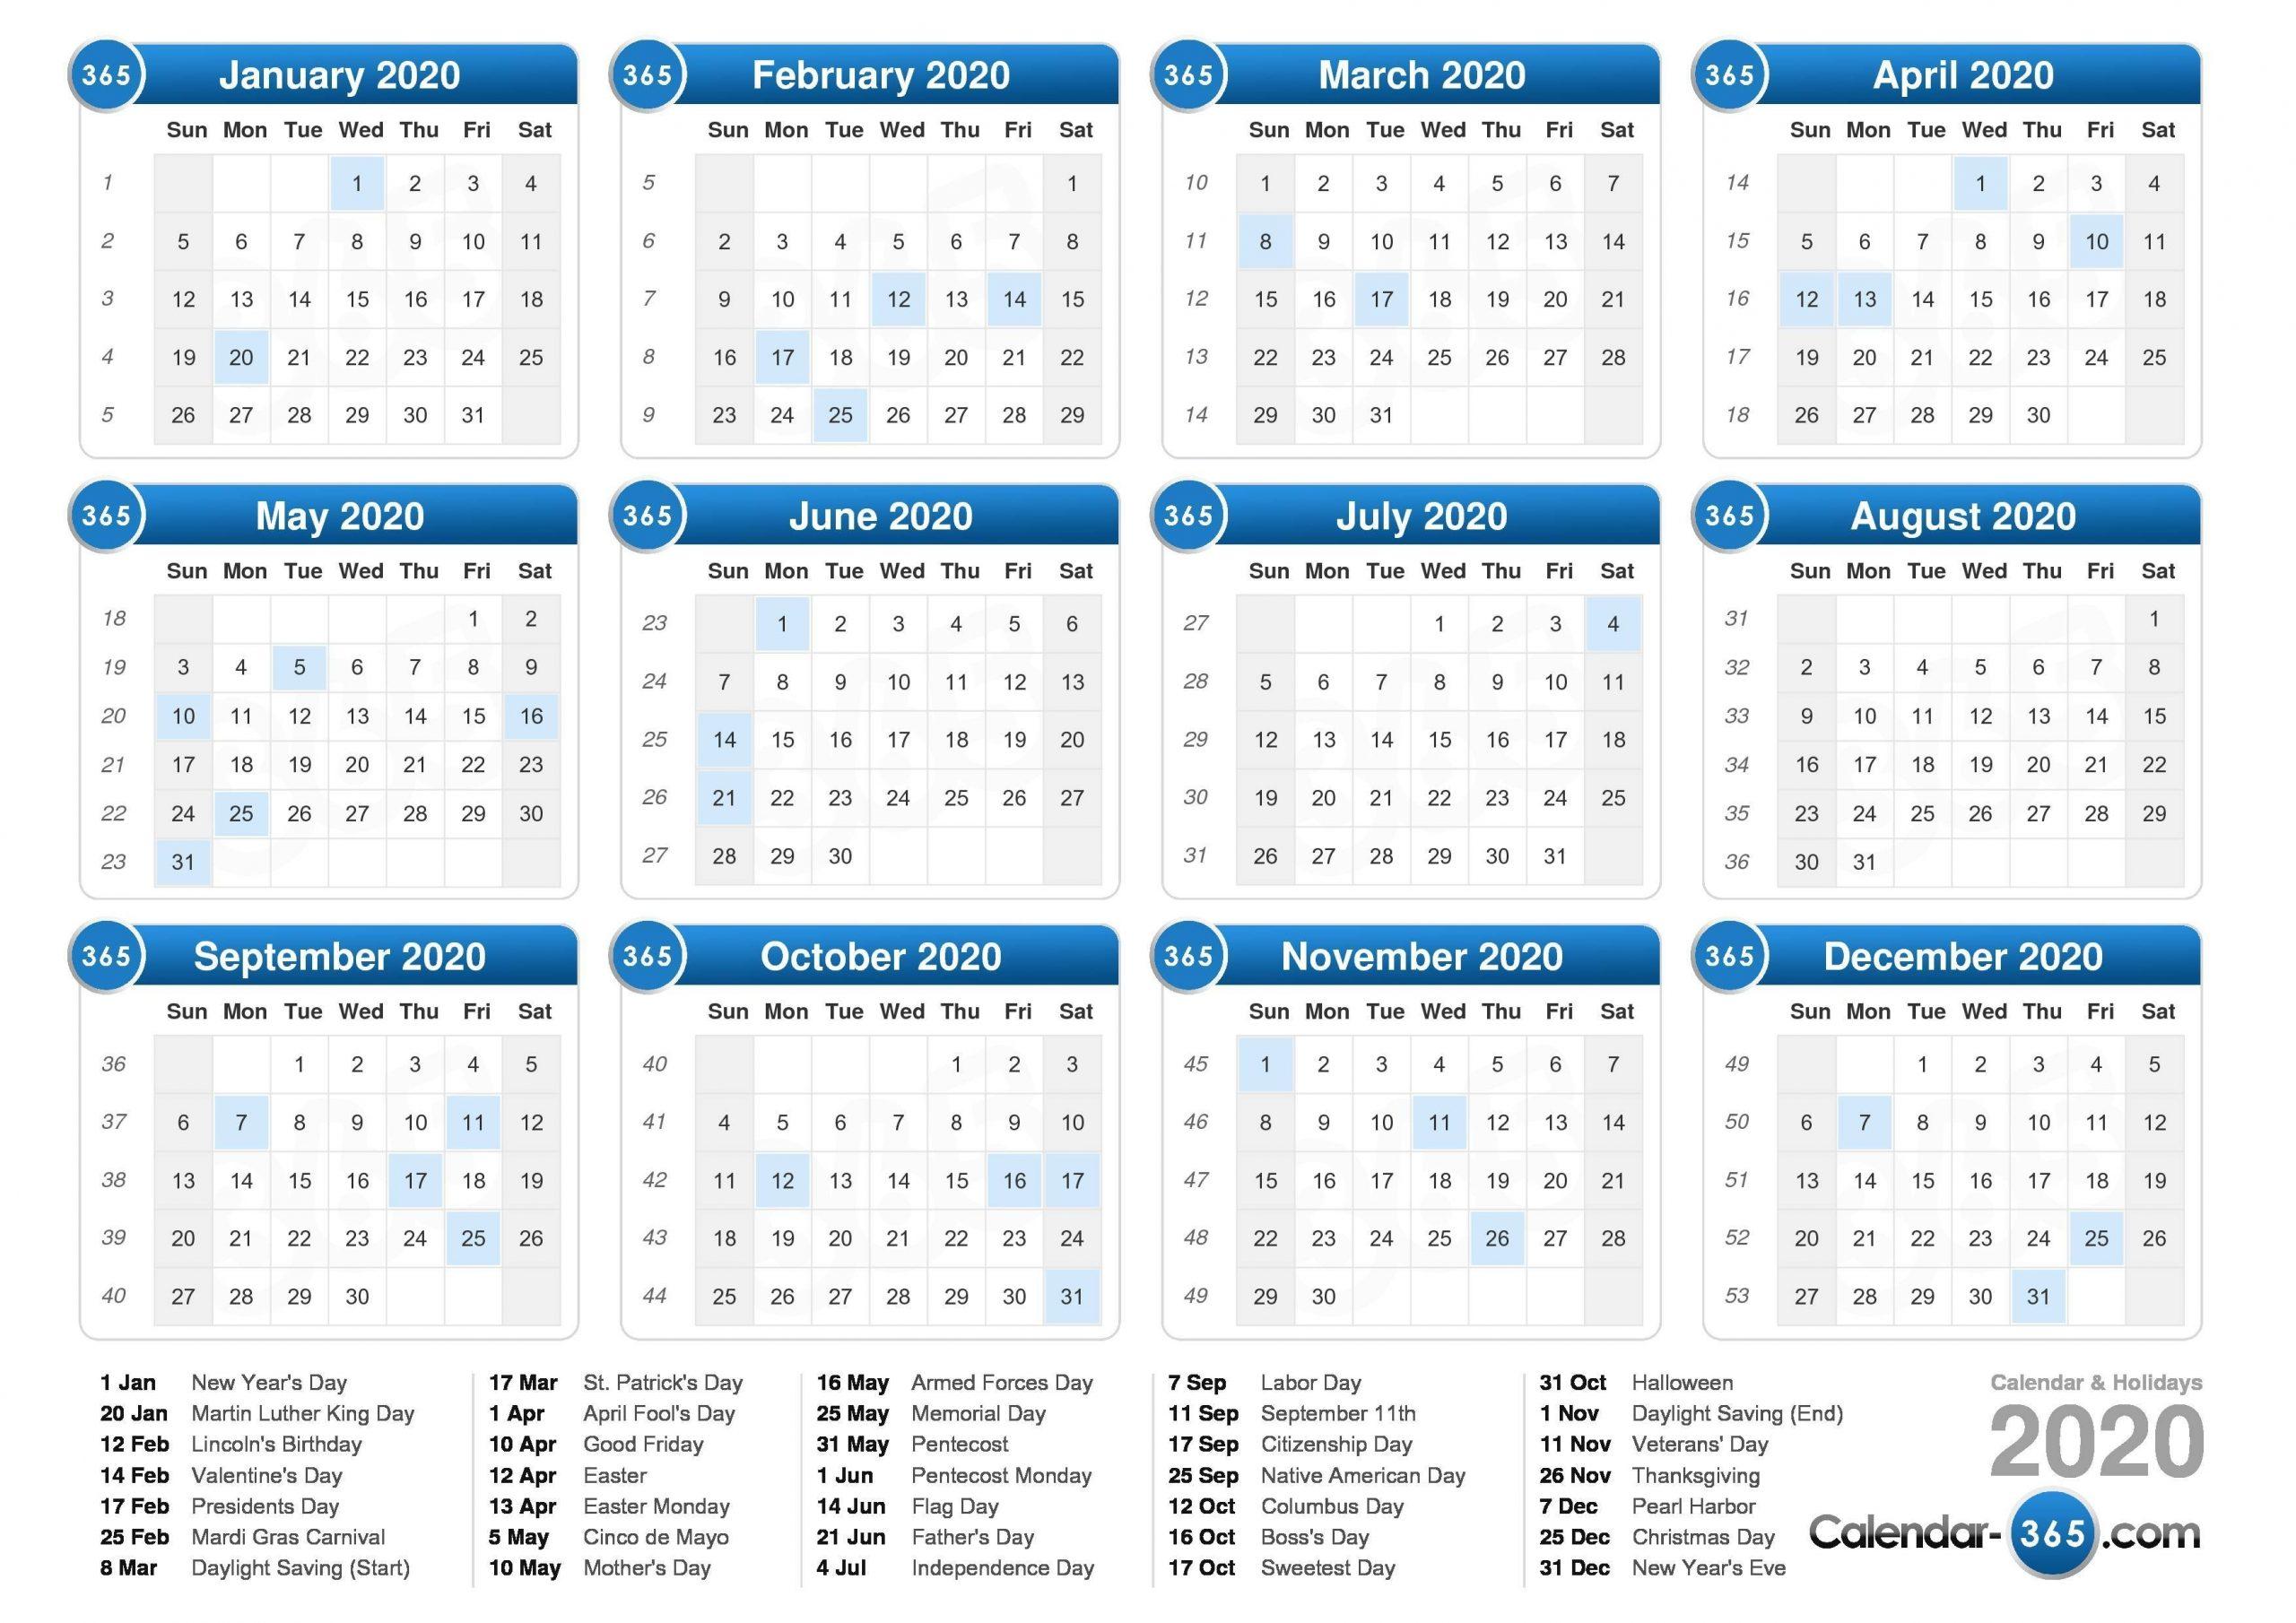 Take Finacial Year Week 1